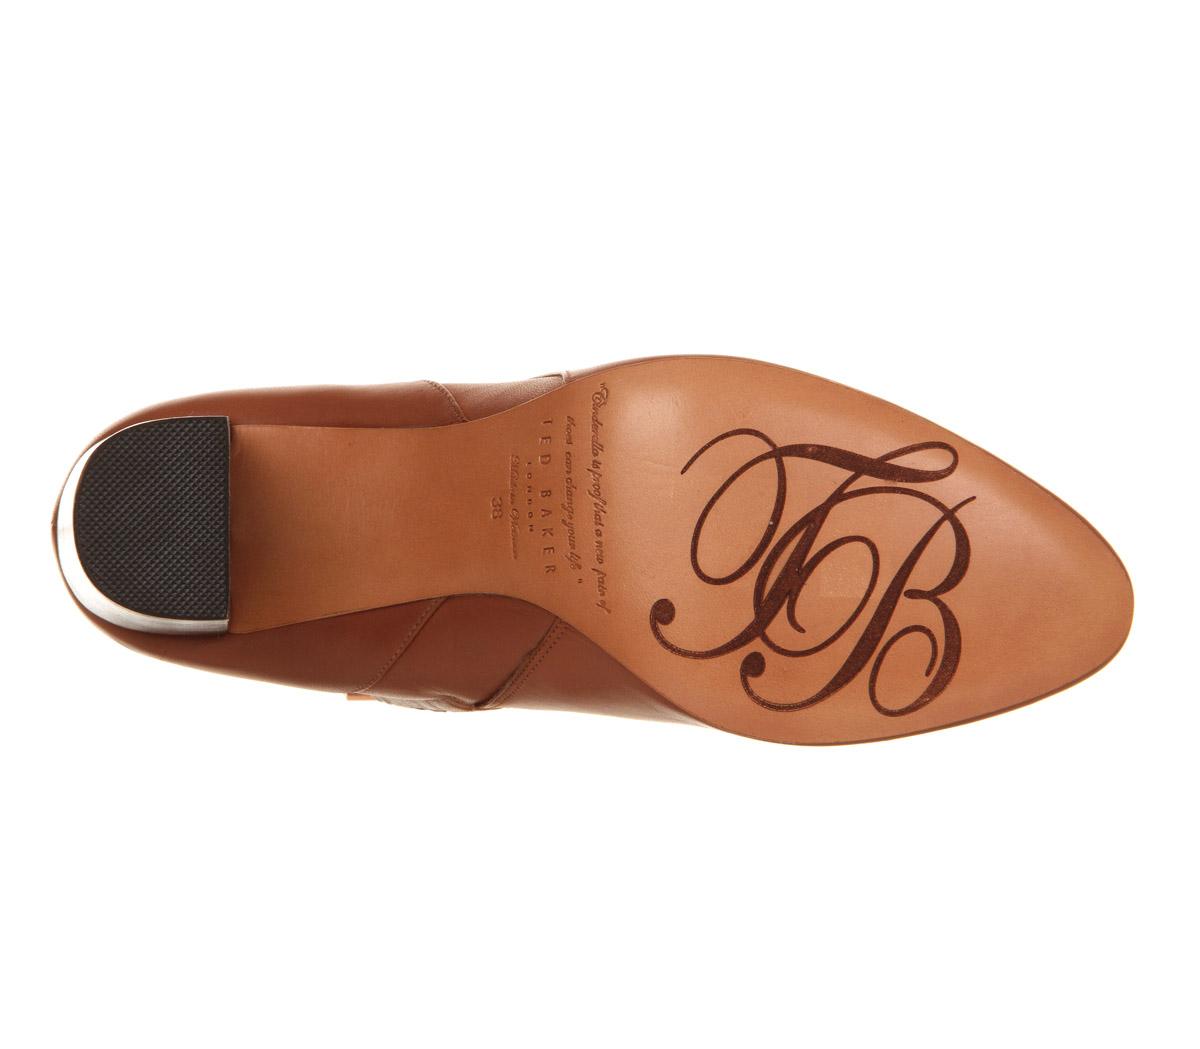 Ted Baker Micka High Heel Boot in Tan (Brown)